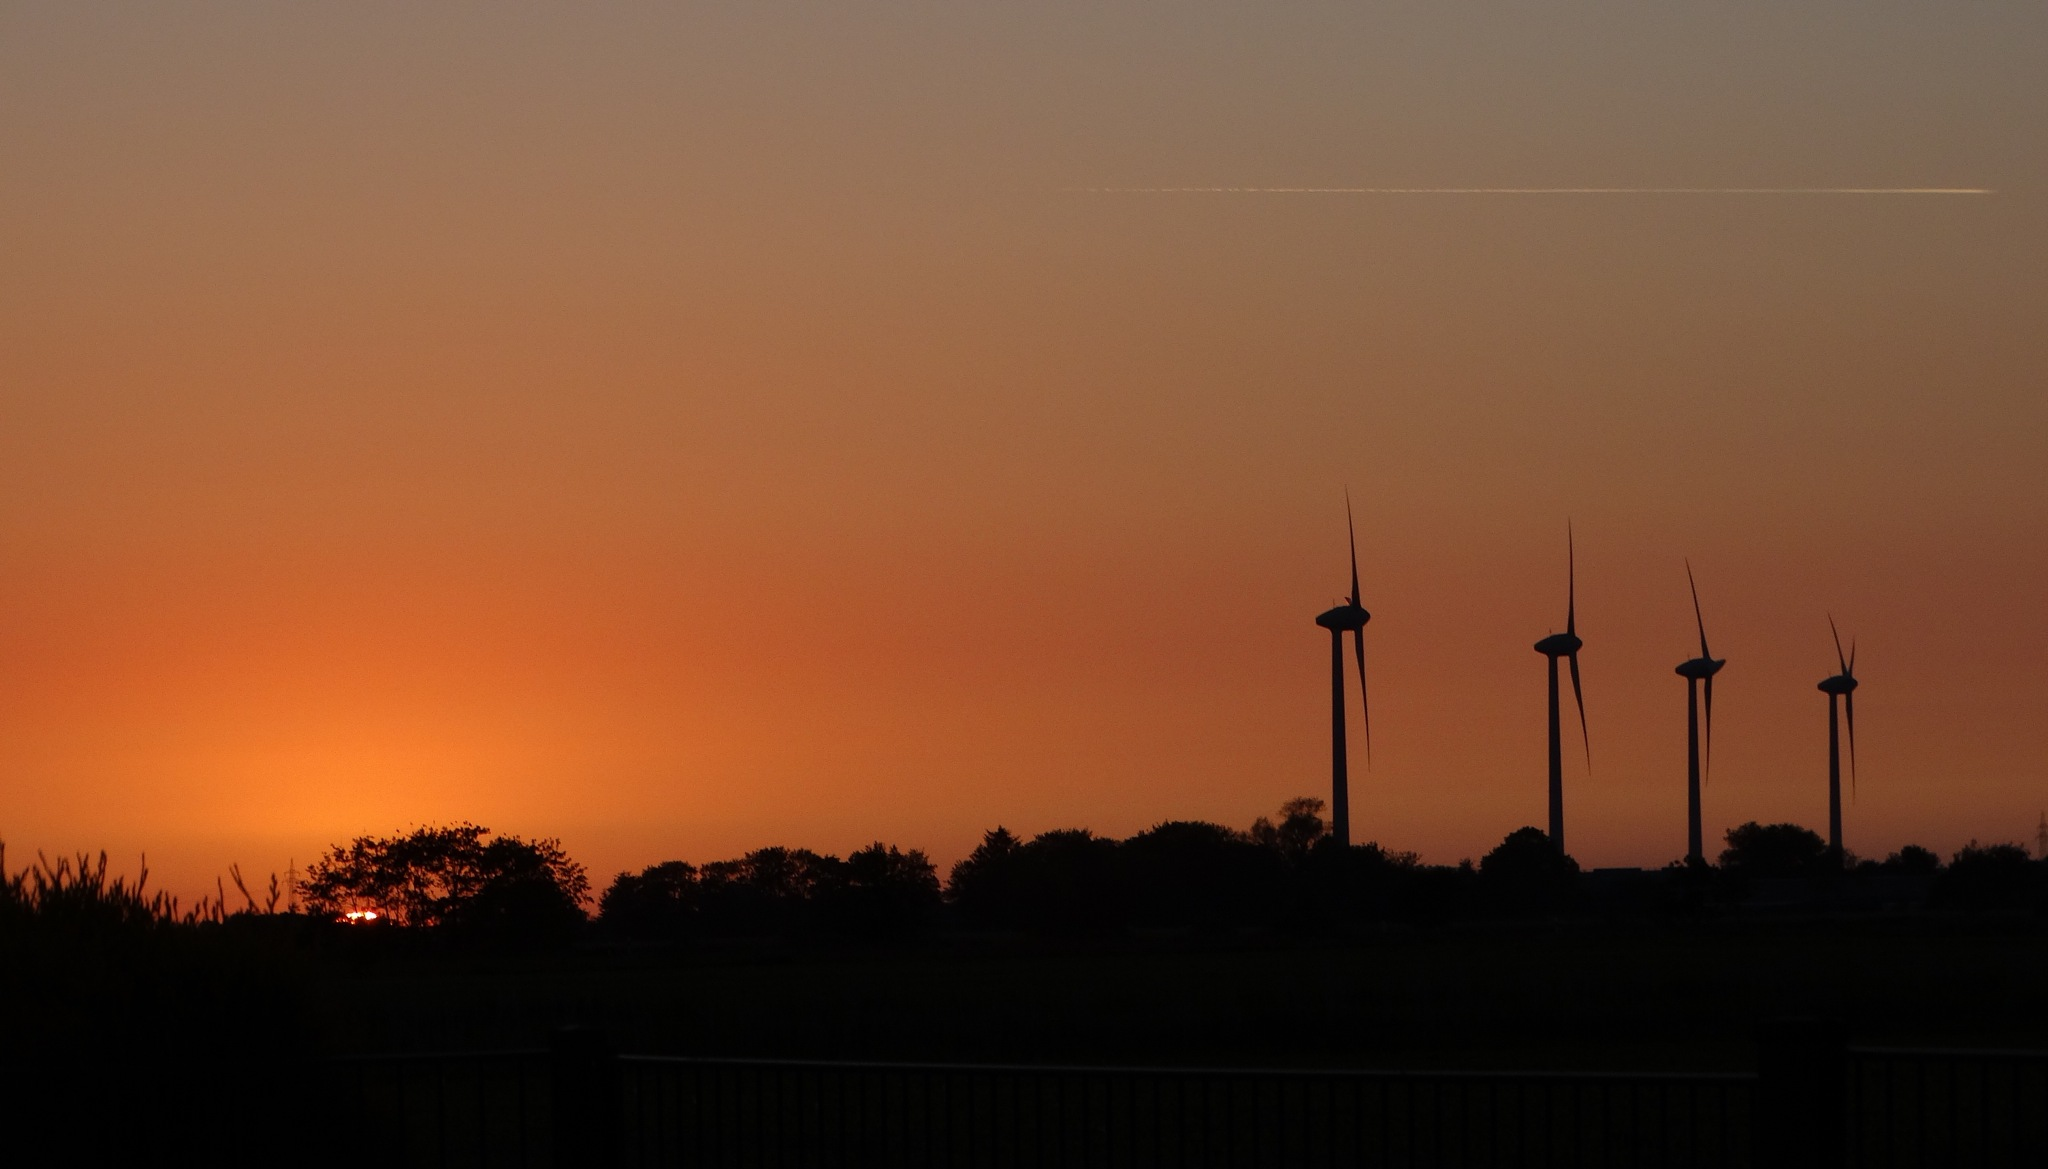 Sunset by Martha de Vries